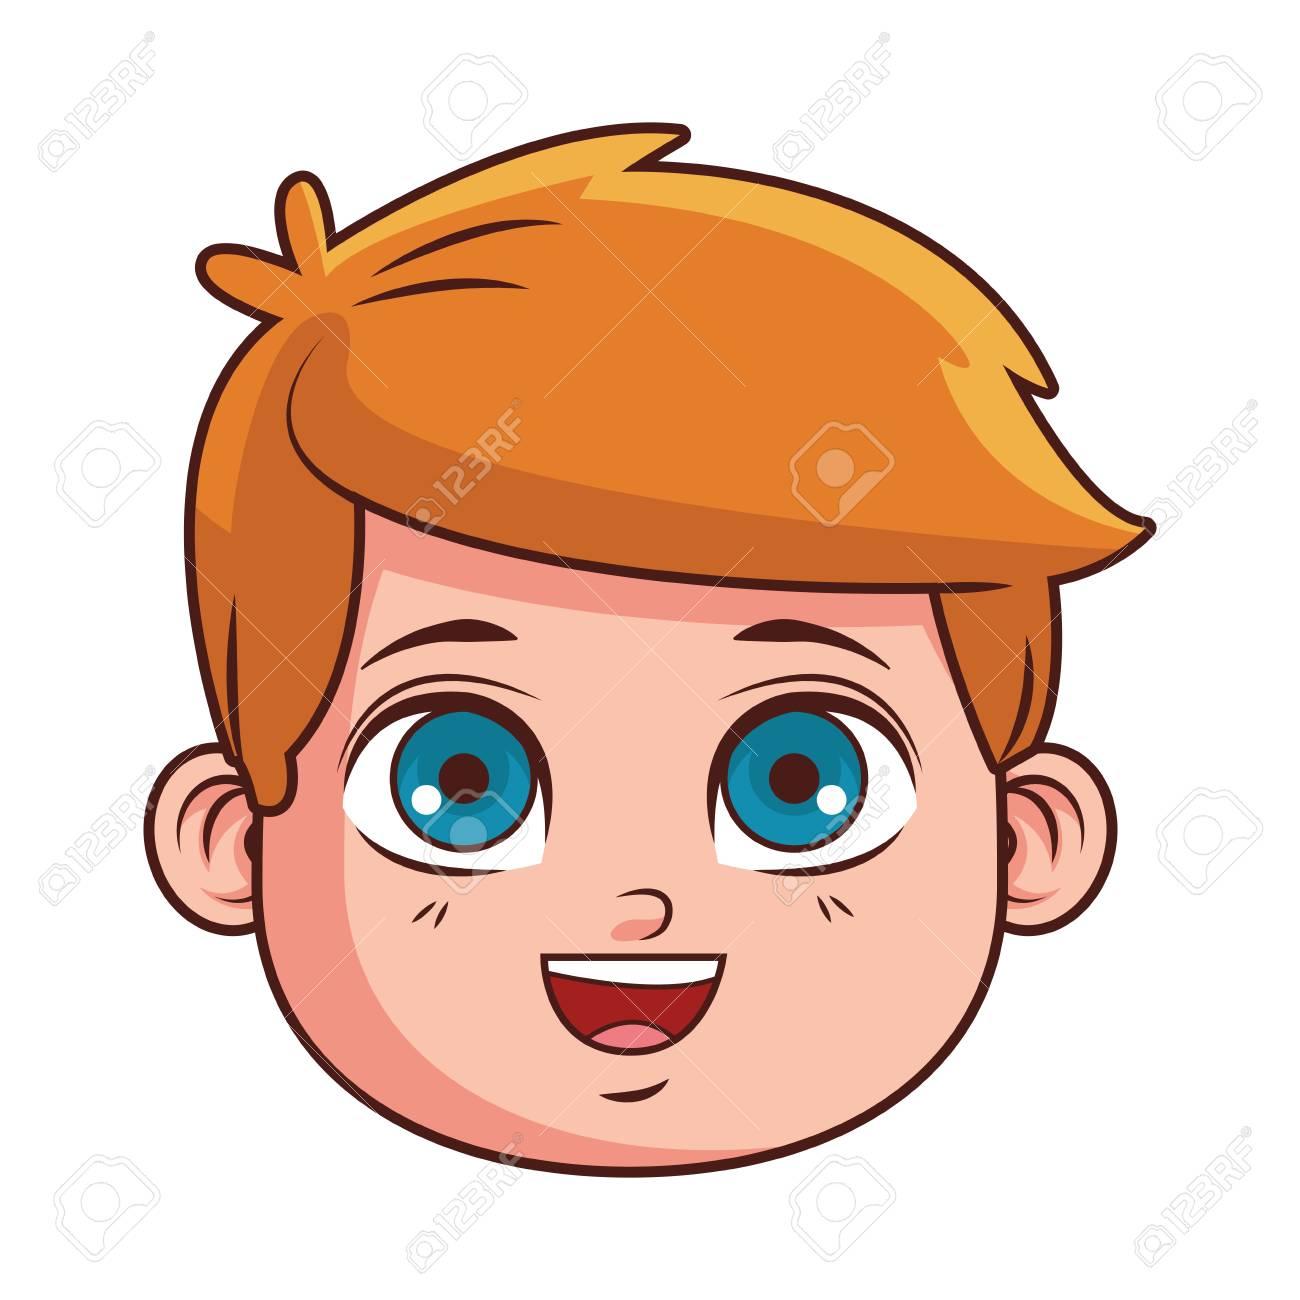 cute boy face cartoon vector illustration graphic design.